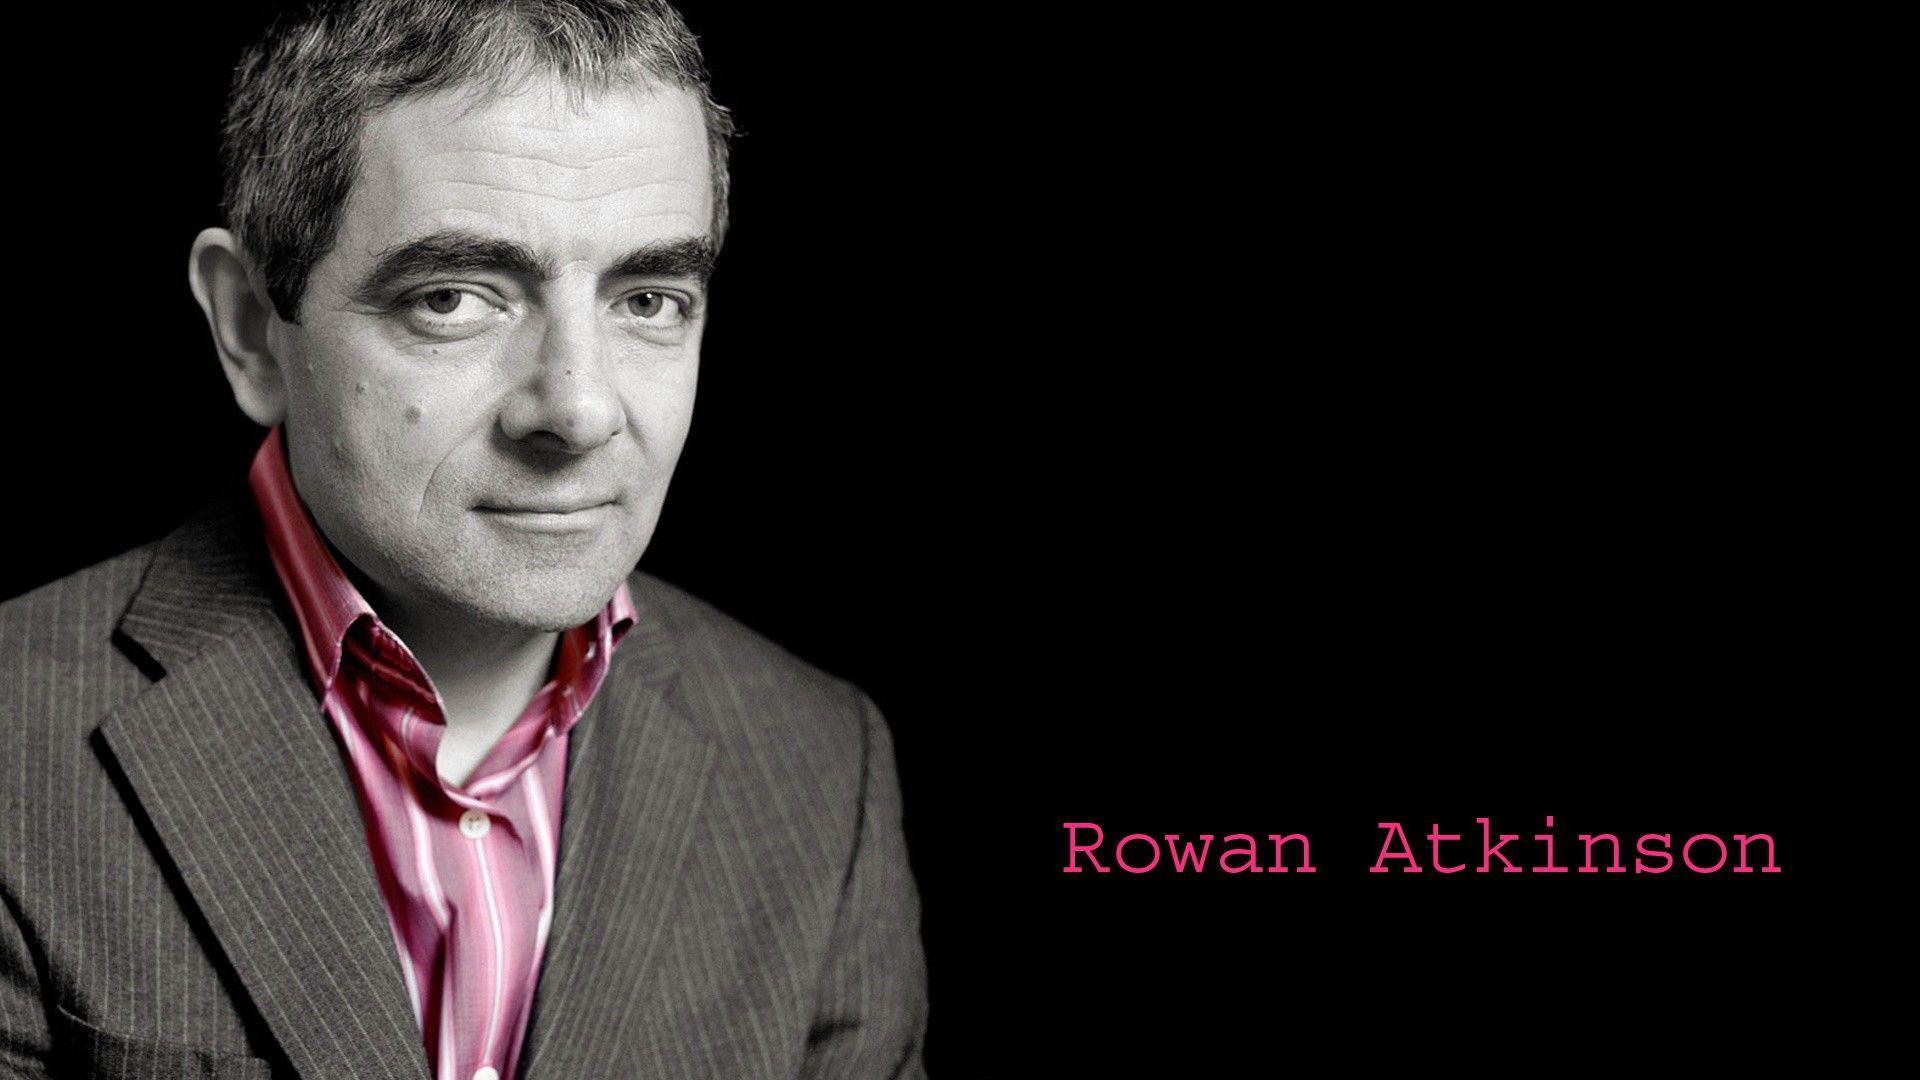 Rowan Atkinson Wallpapers Wallpaper Cave